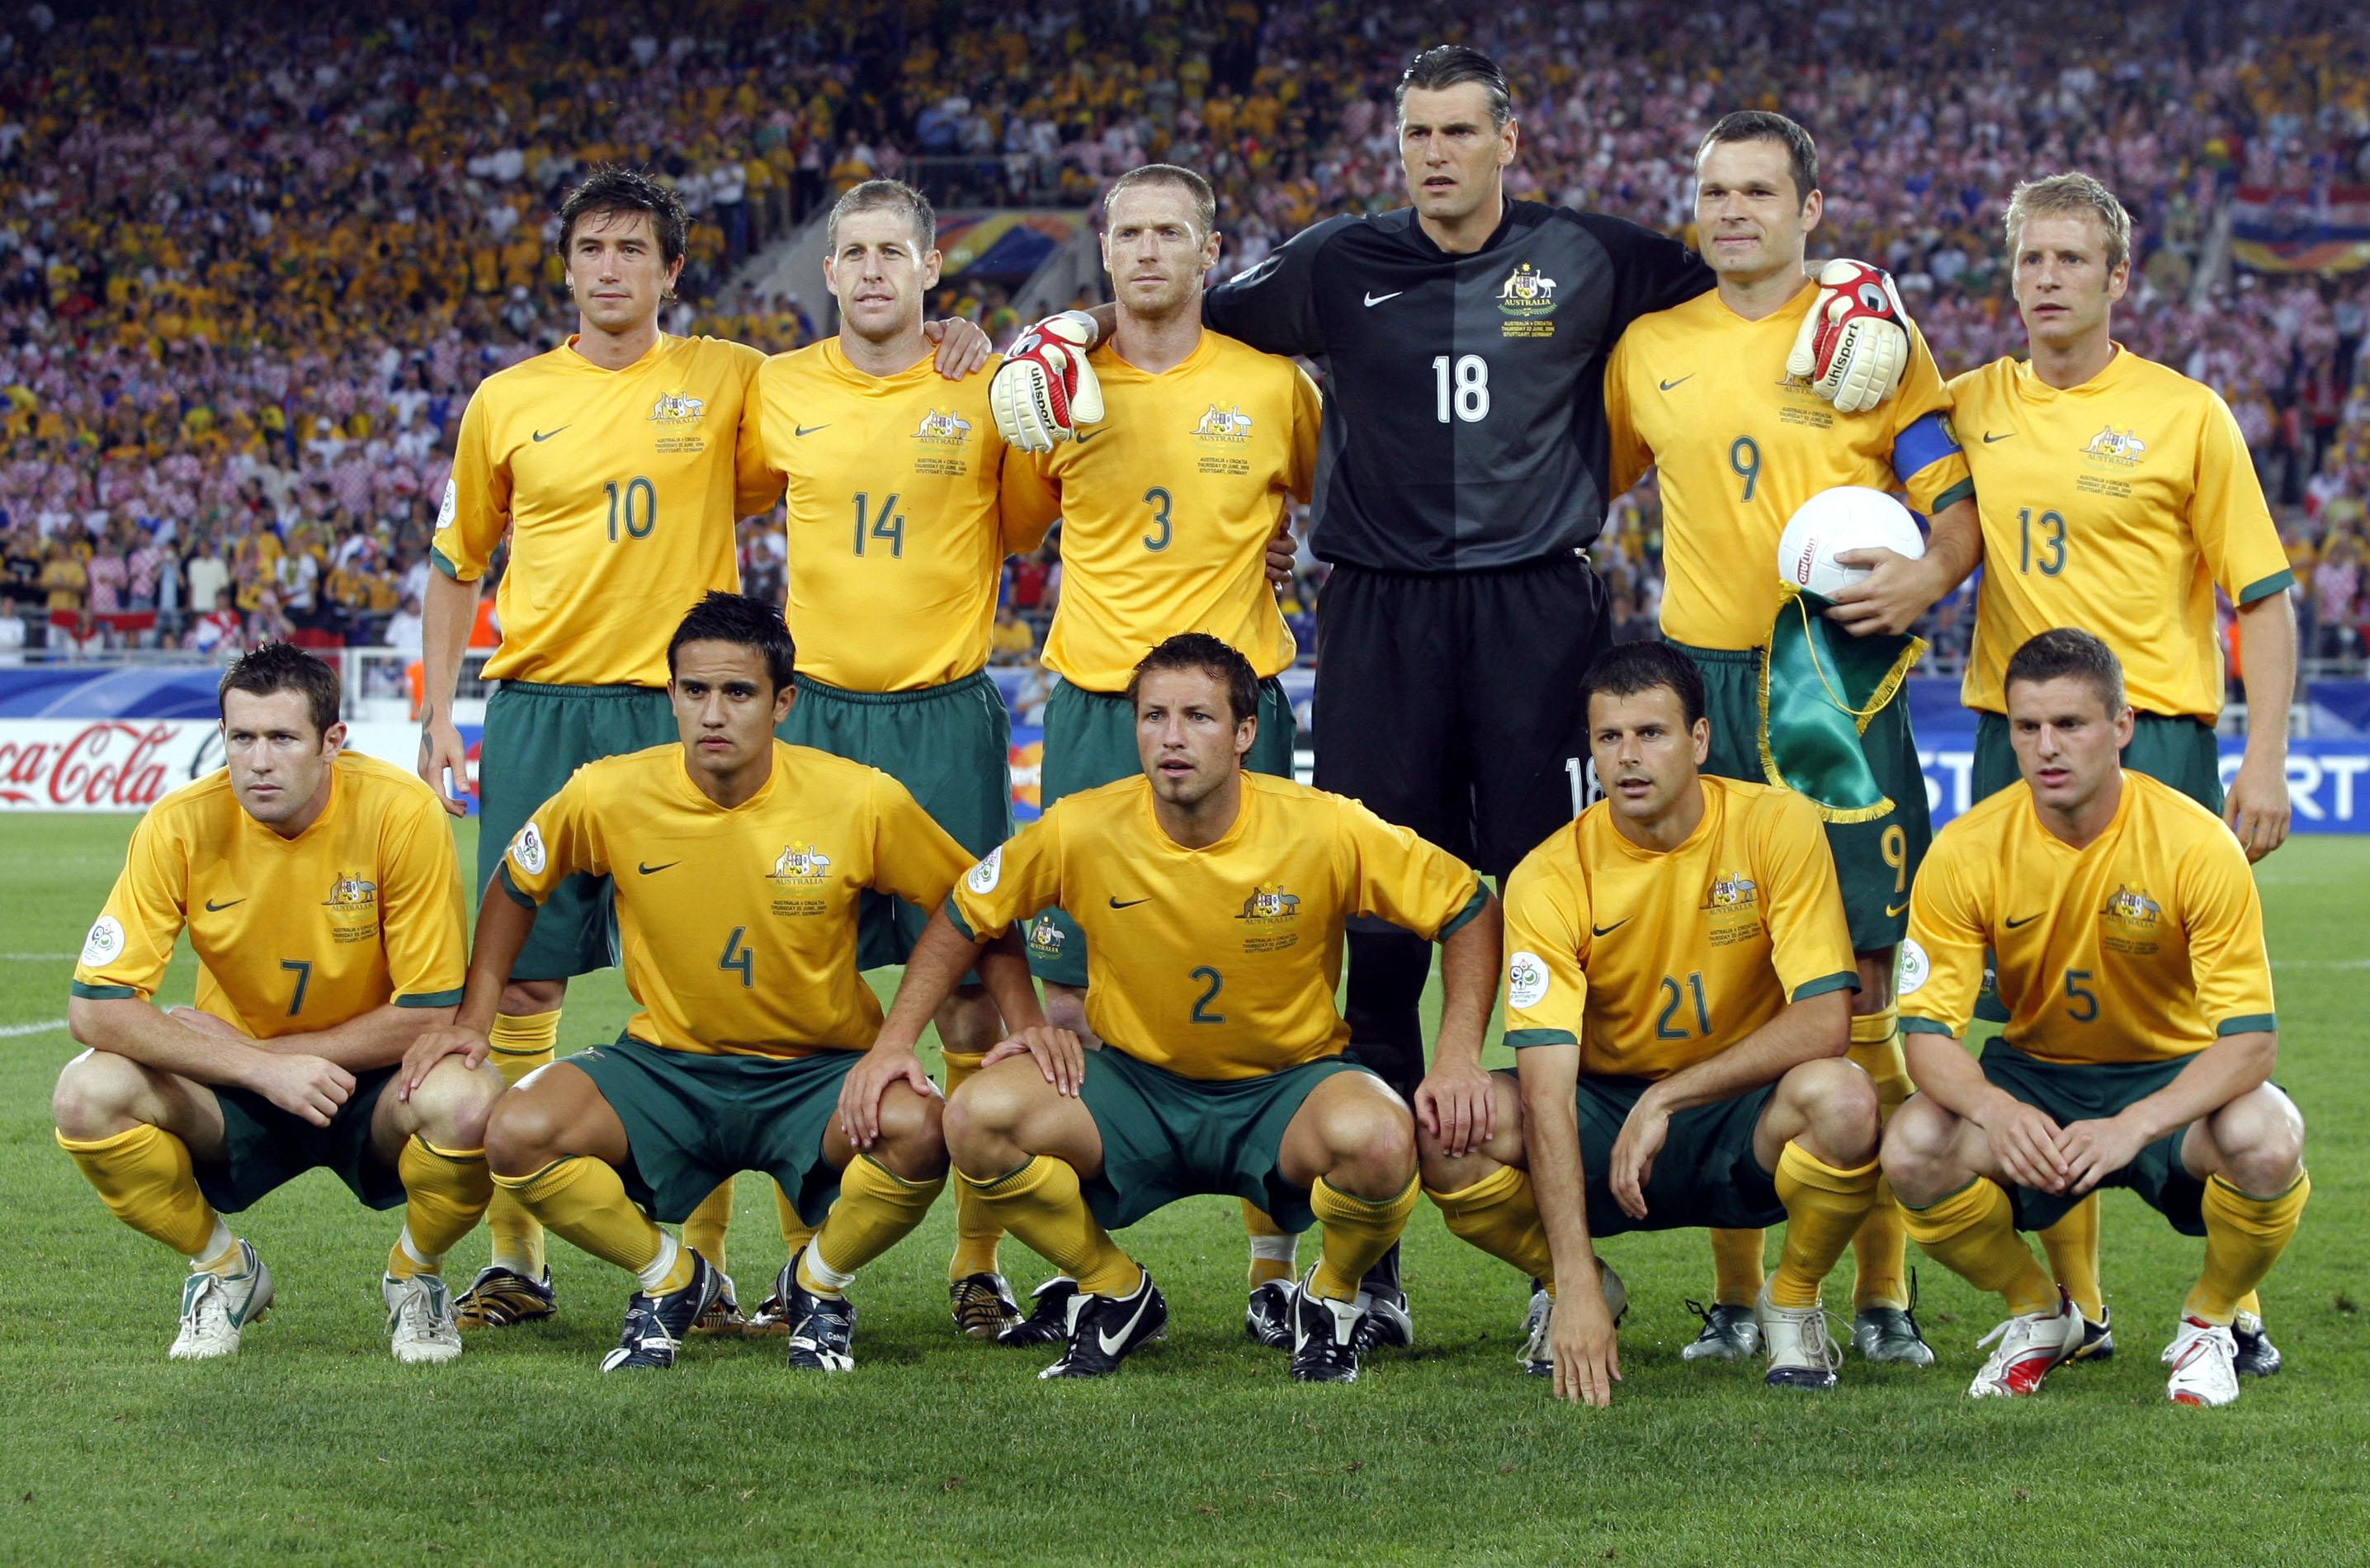 australia 2006 world cup ile ilgili görsel sonucu